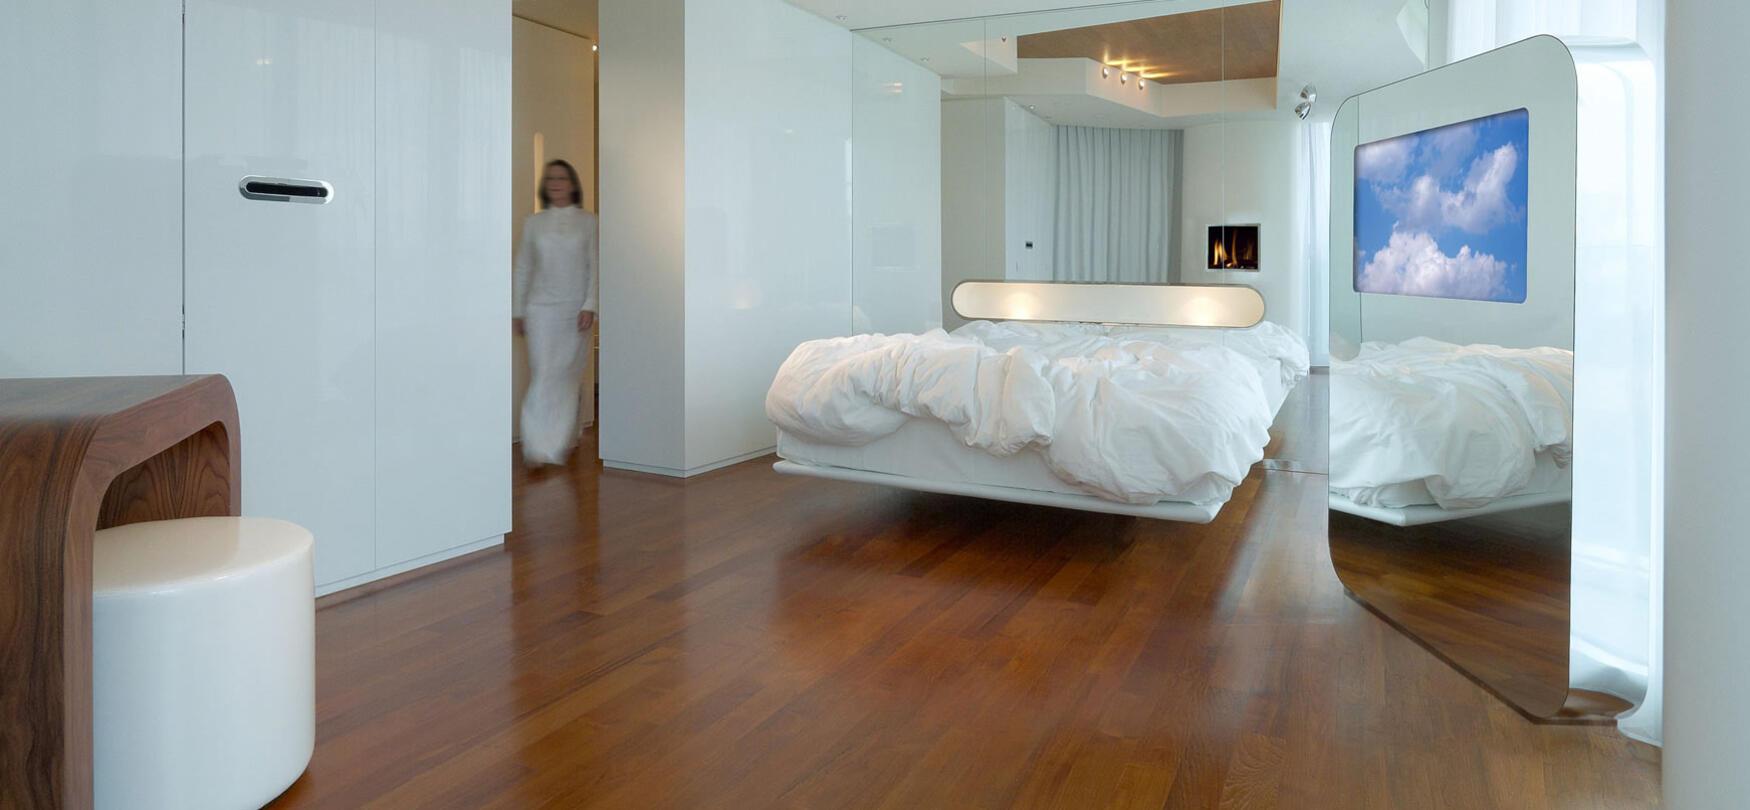 ambienthotels en rooms-isuite 008